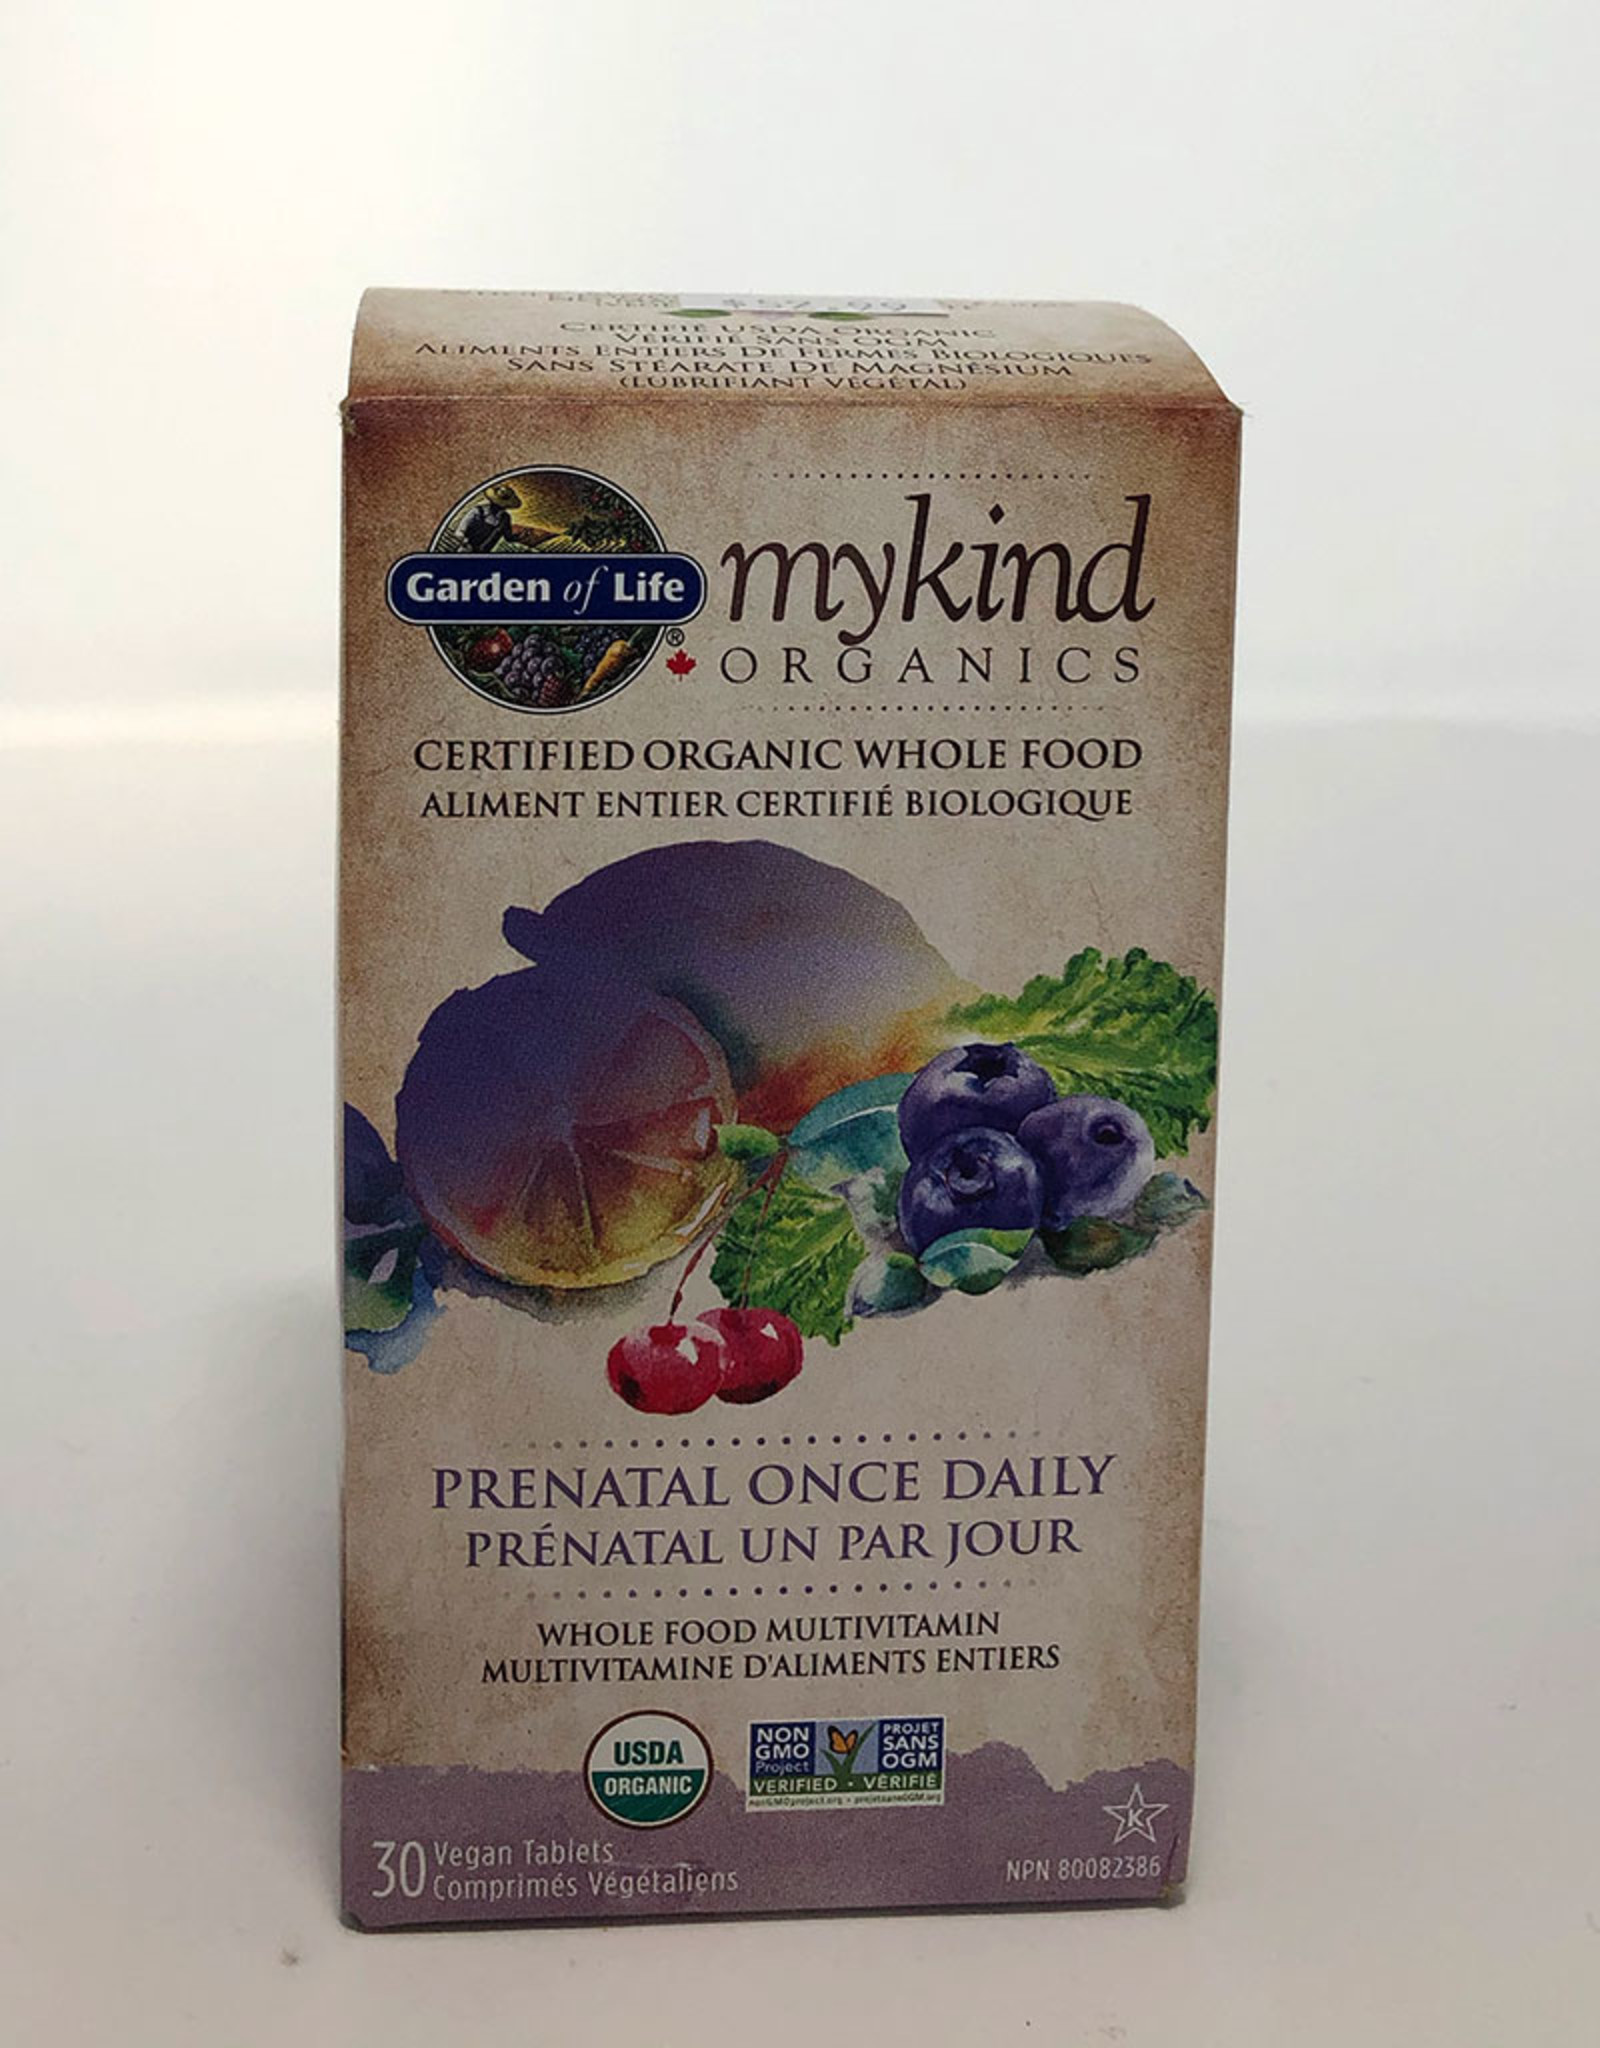 Garden of Life Garden of Life - mykind Organics Prenatal Once Daily (30Vtabs)